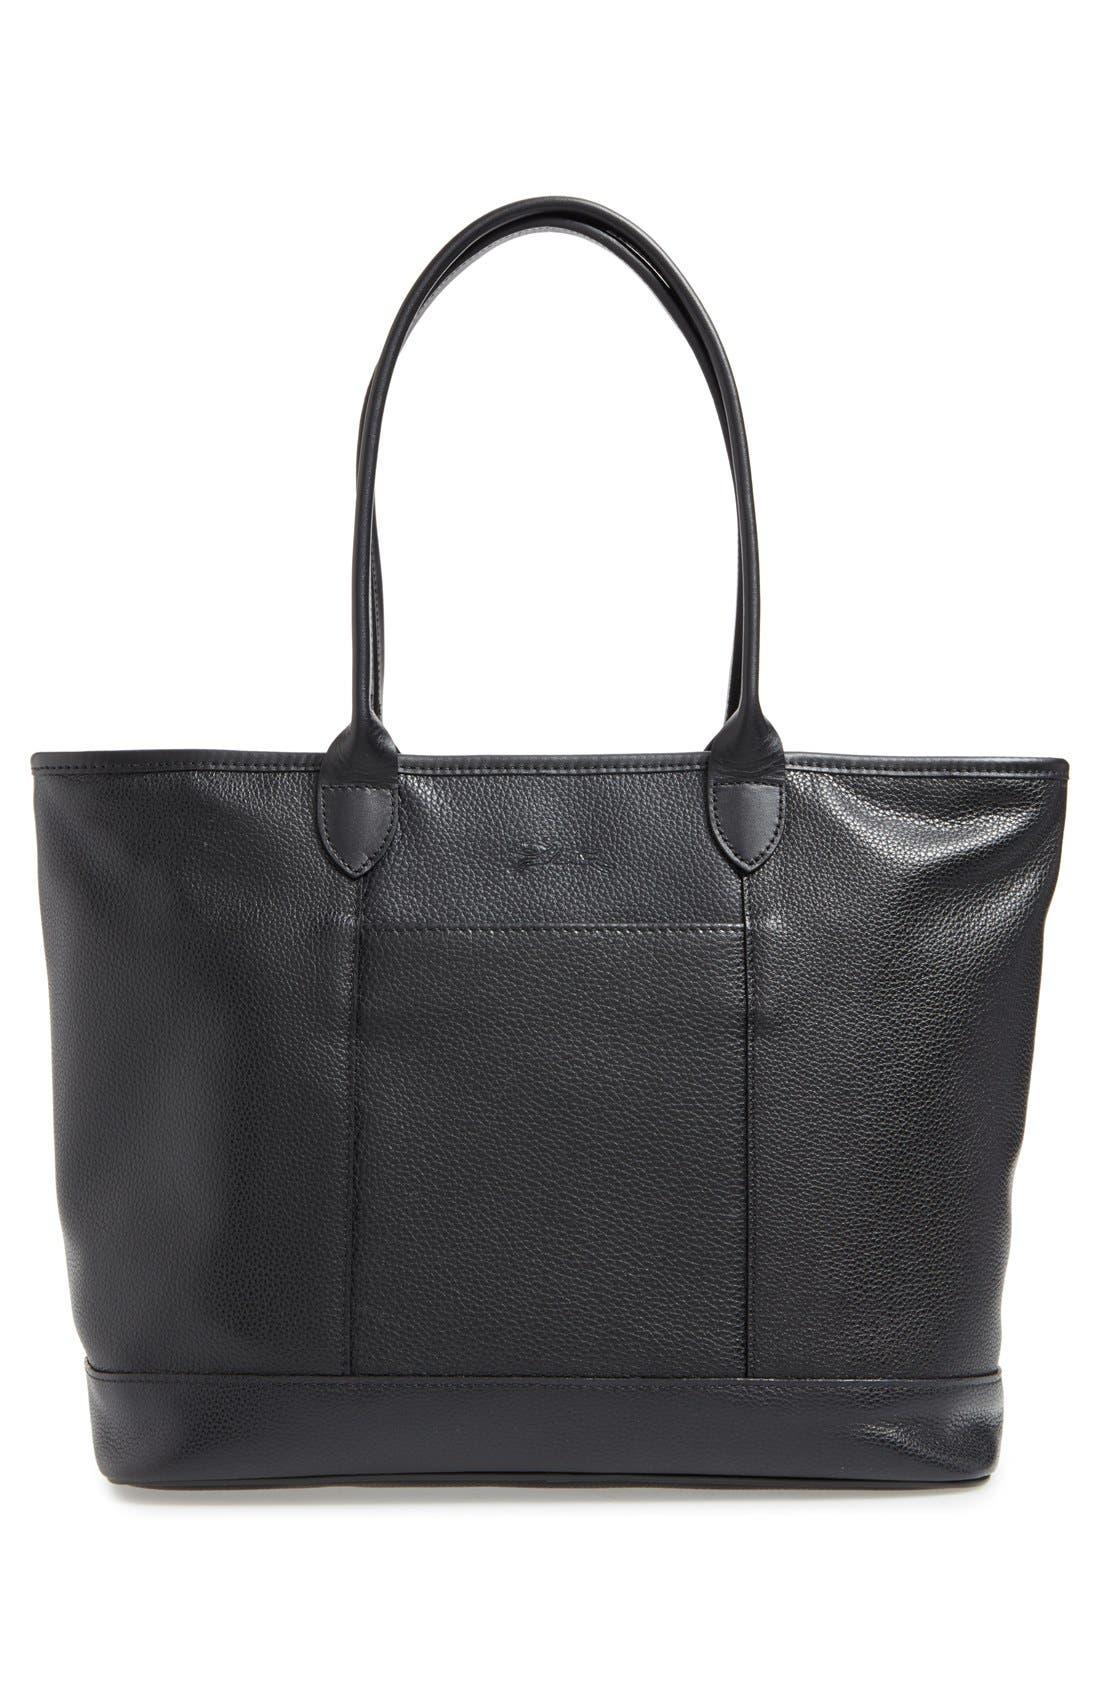 Alternate Image 3  - Longchamp 'Veau' Leather Tote